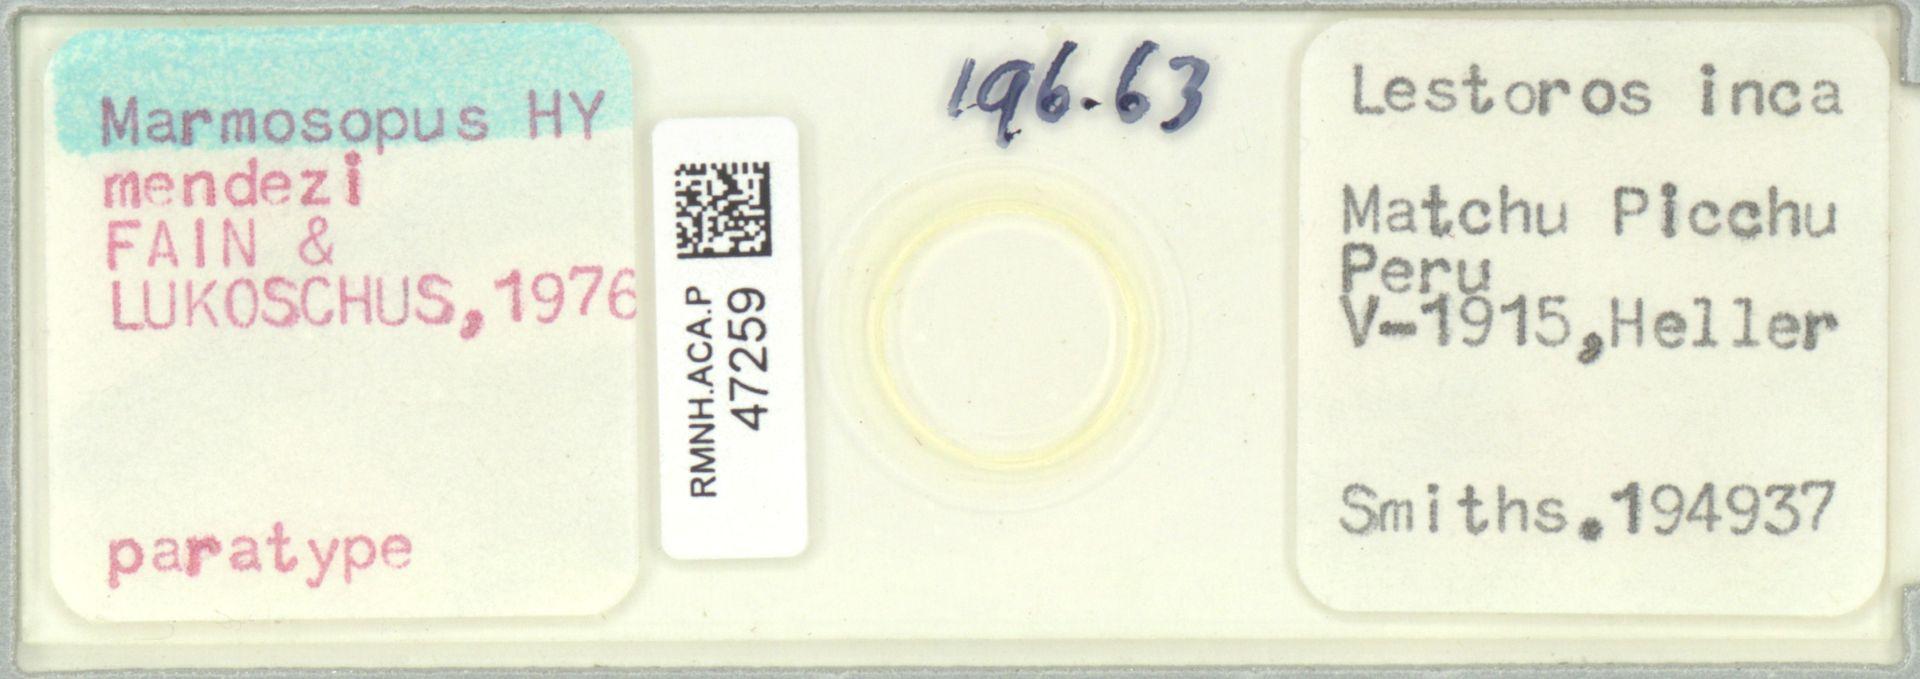 RMNH.ACA.P.47259 | Marmosopus mendezi Fain & Lukoschus,1976